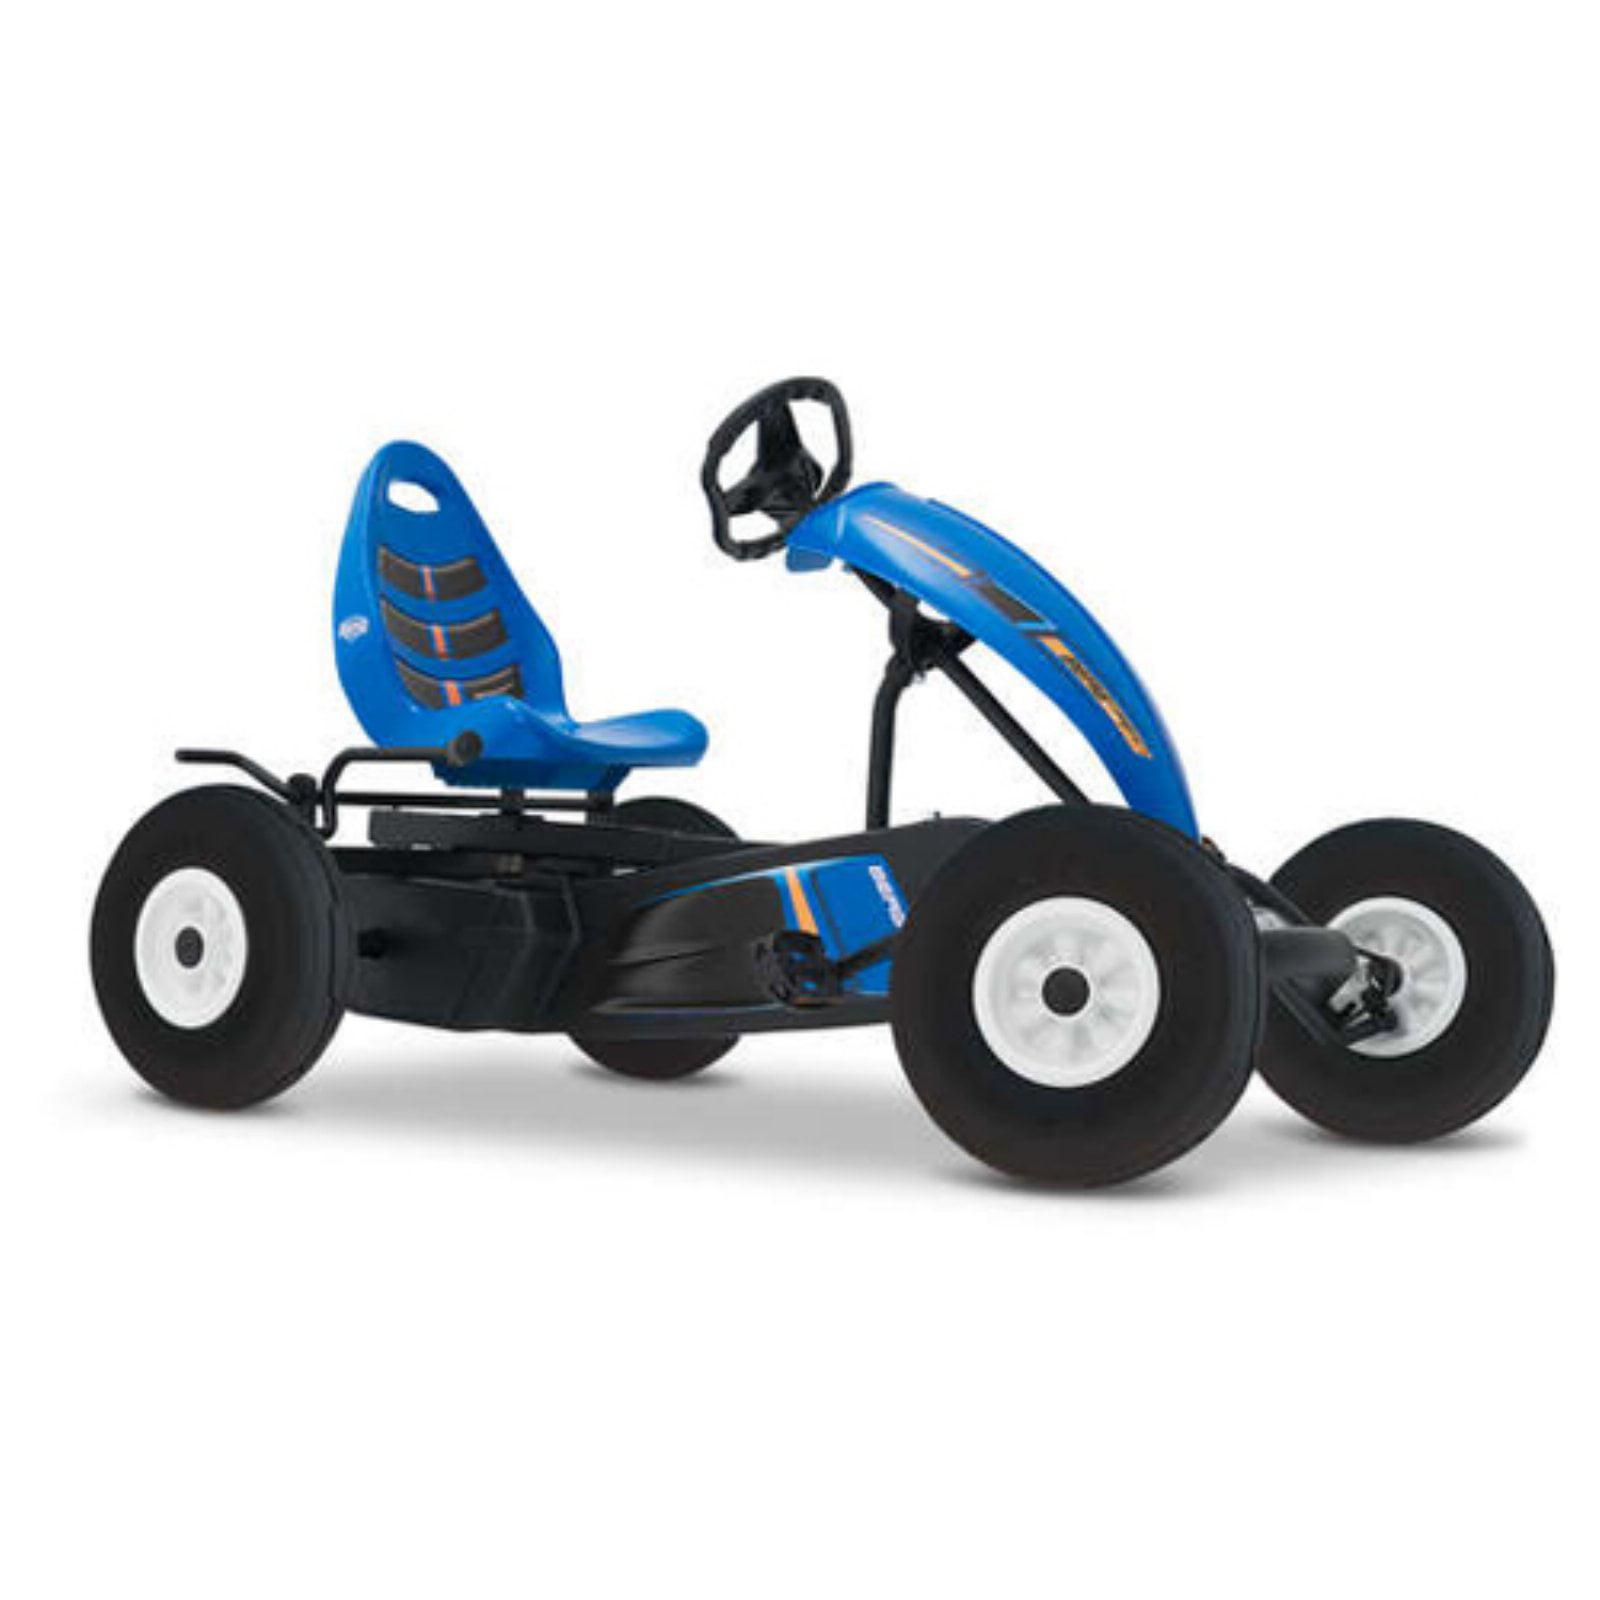 BERG Toys Berg Pedal Go Kart Compact Sport BFR by Berg USA